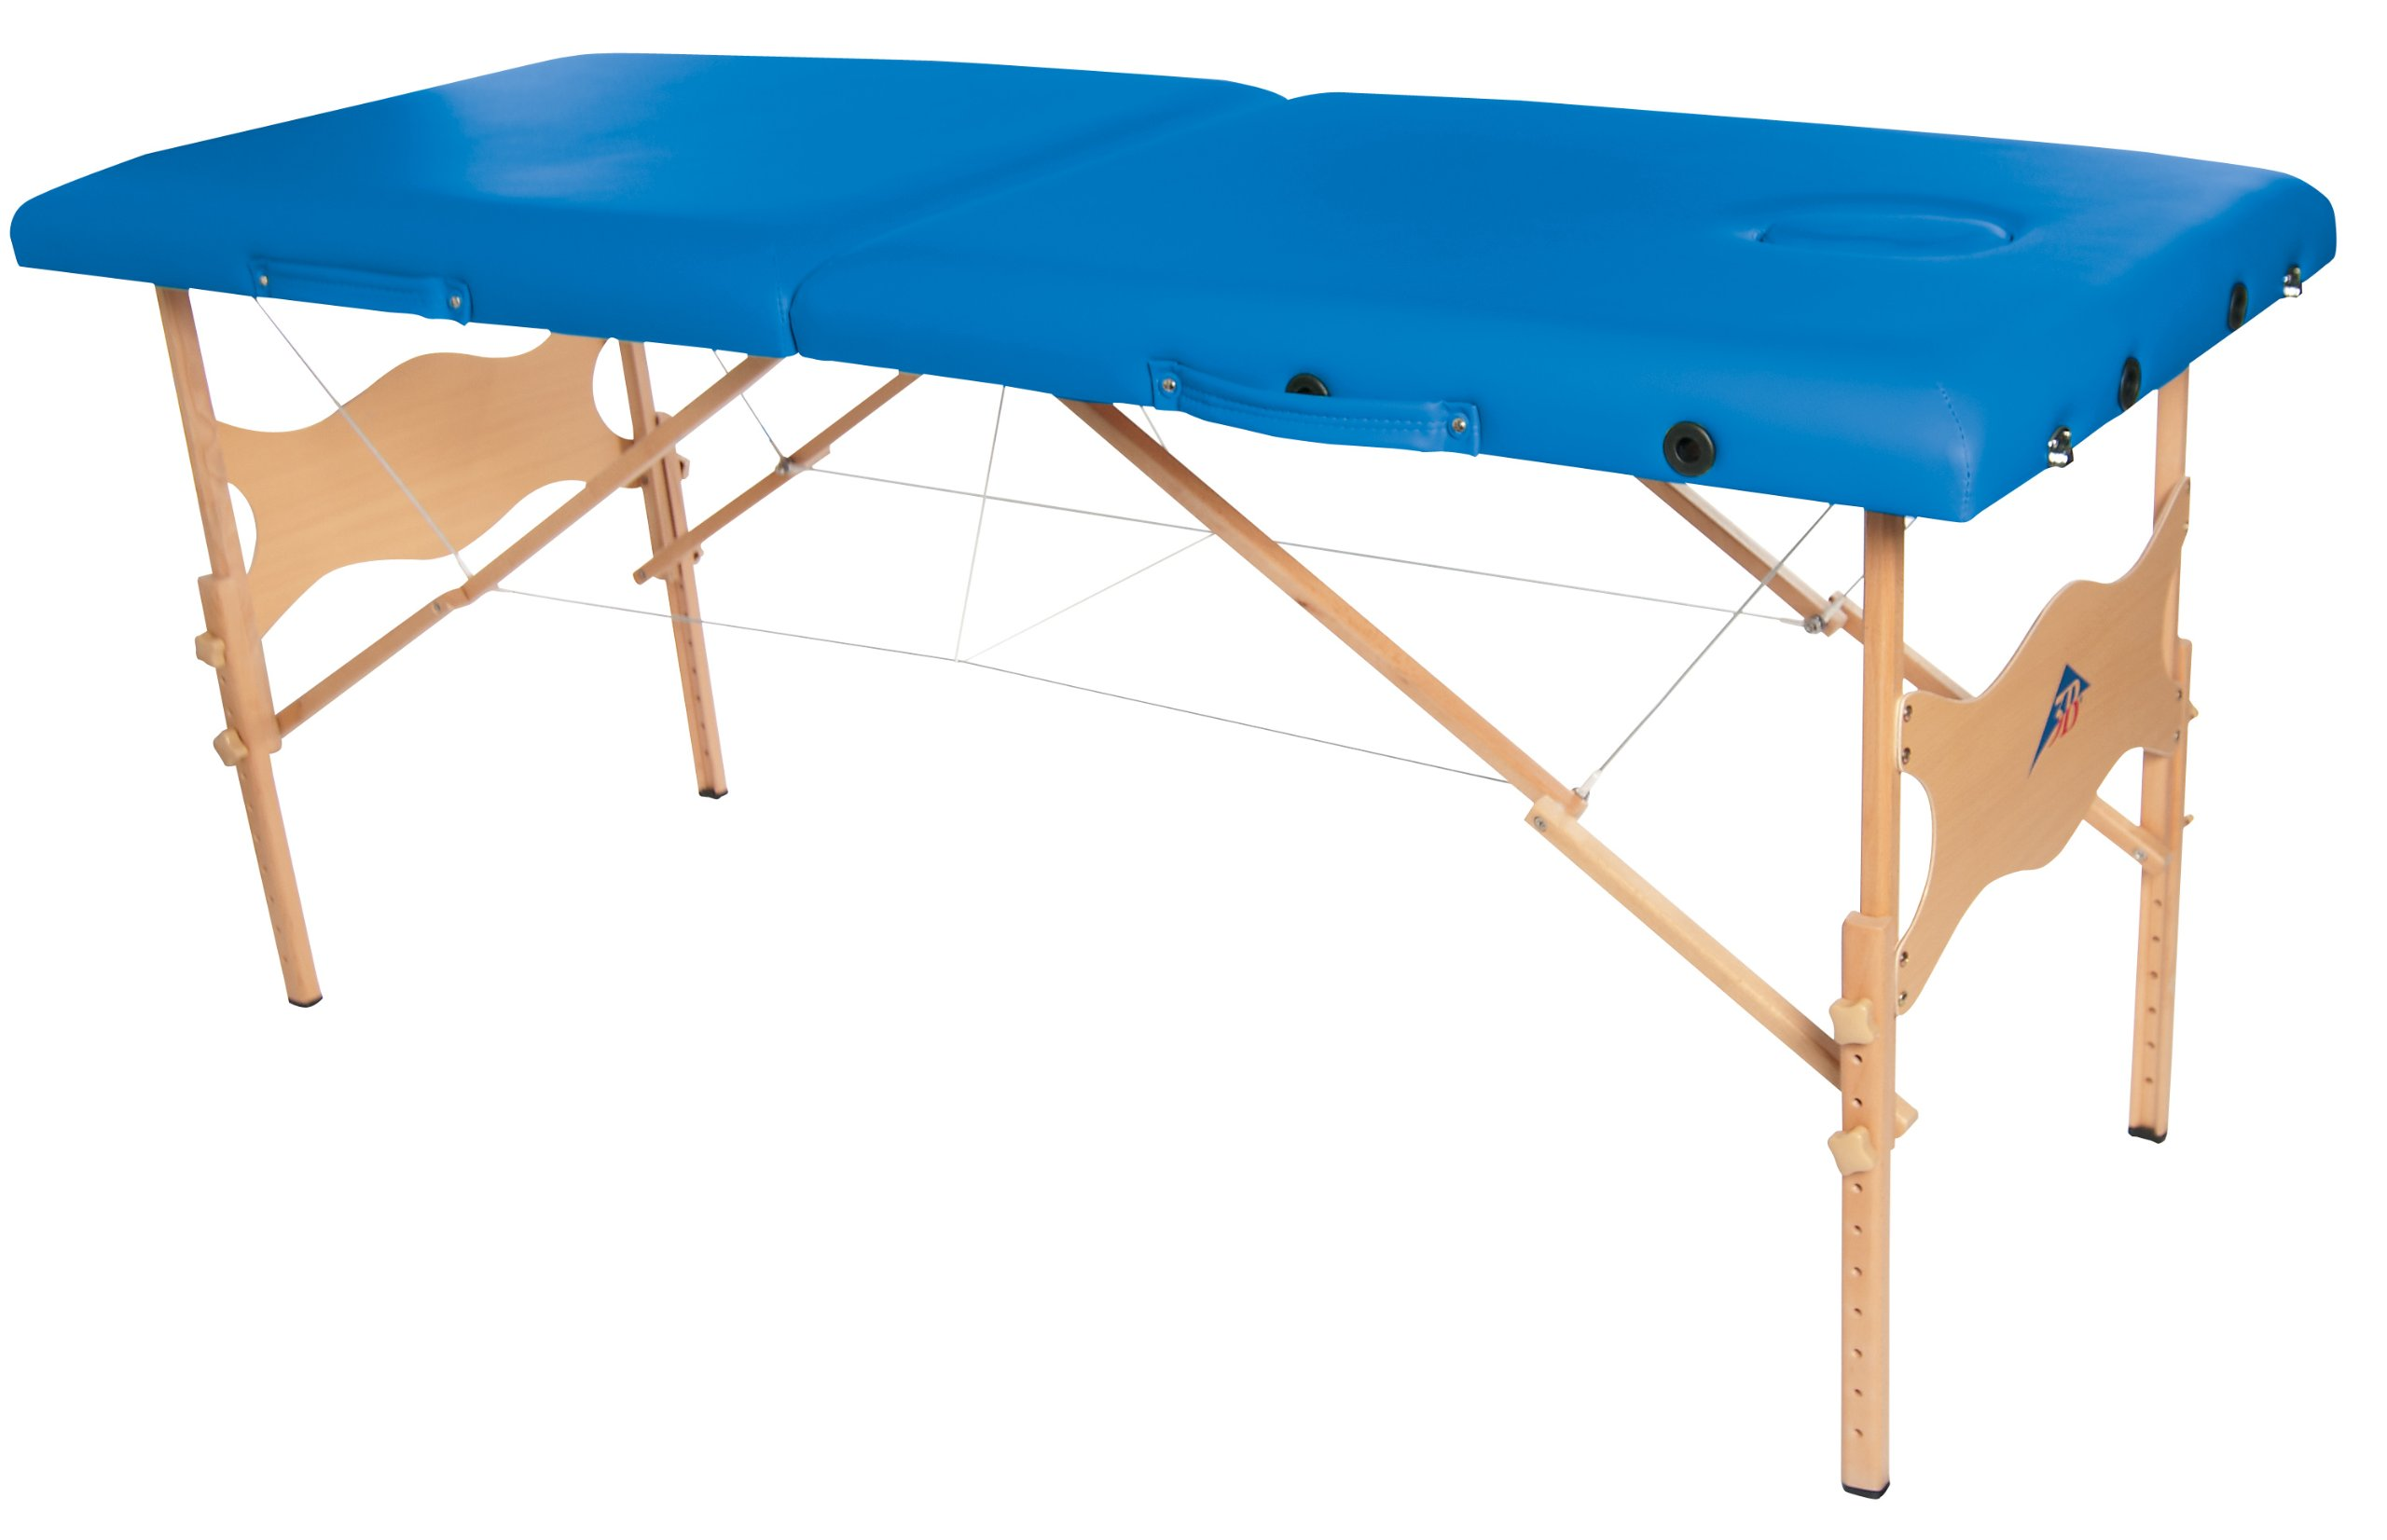 3B Scientific W60601B-1 Wood Basic Portable Massage Table, 550lbs Capacity, 25''-33'' Adjustable Height, Blue